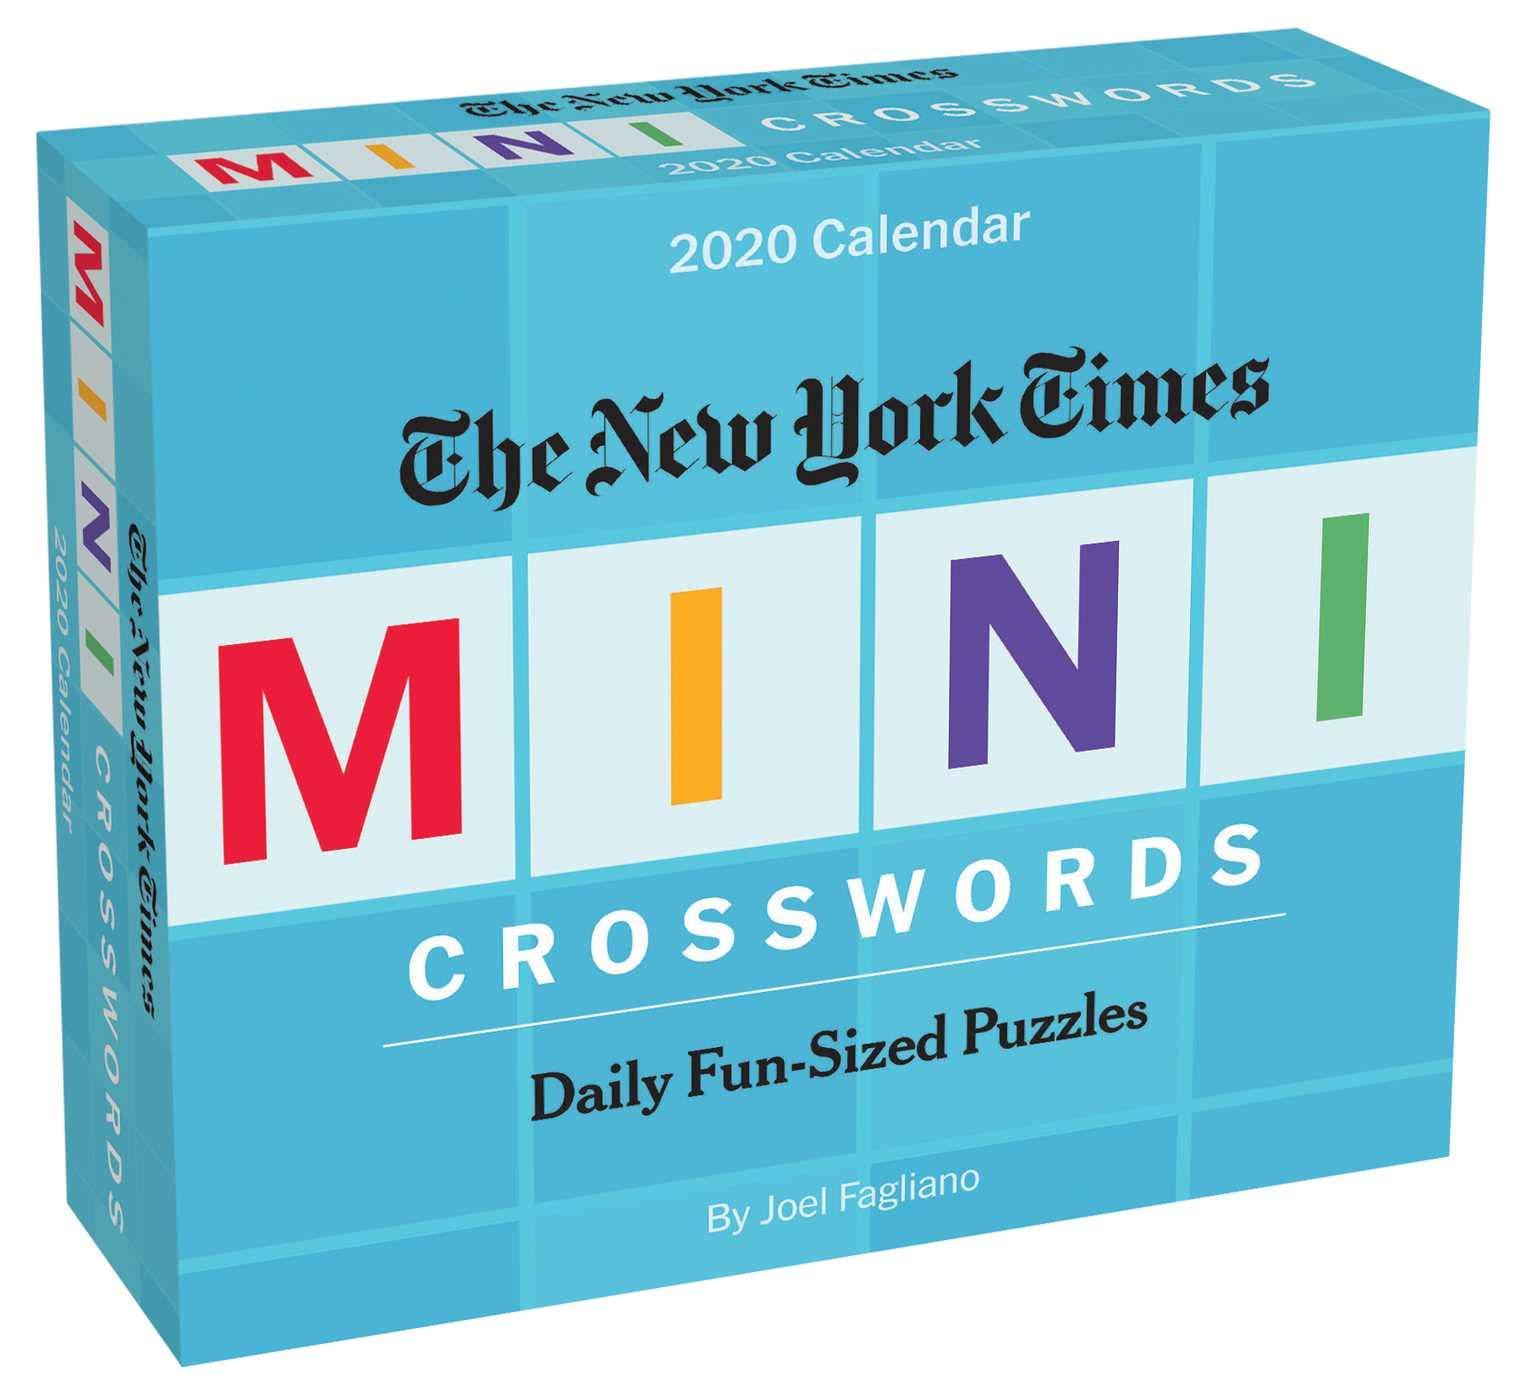 Box for The New York Times Mini Crossword Calendar